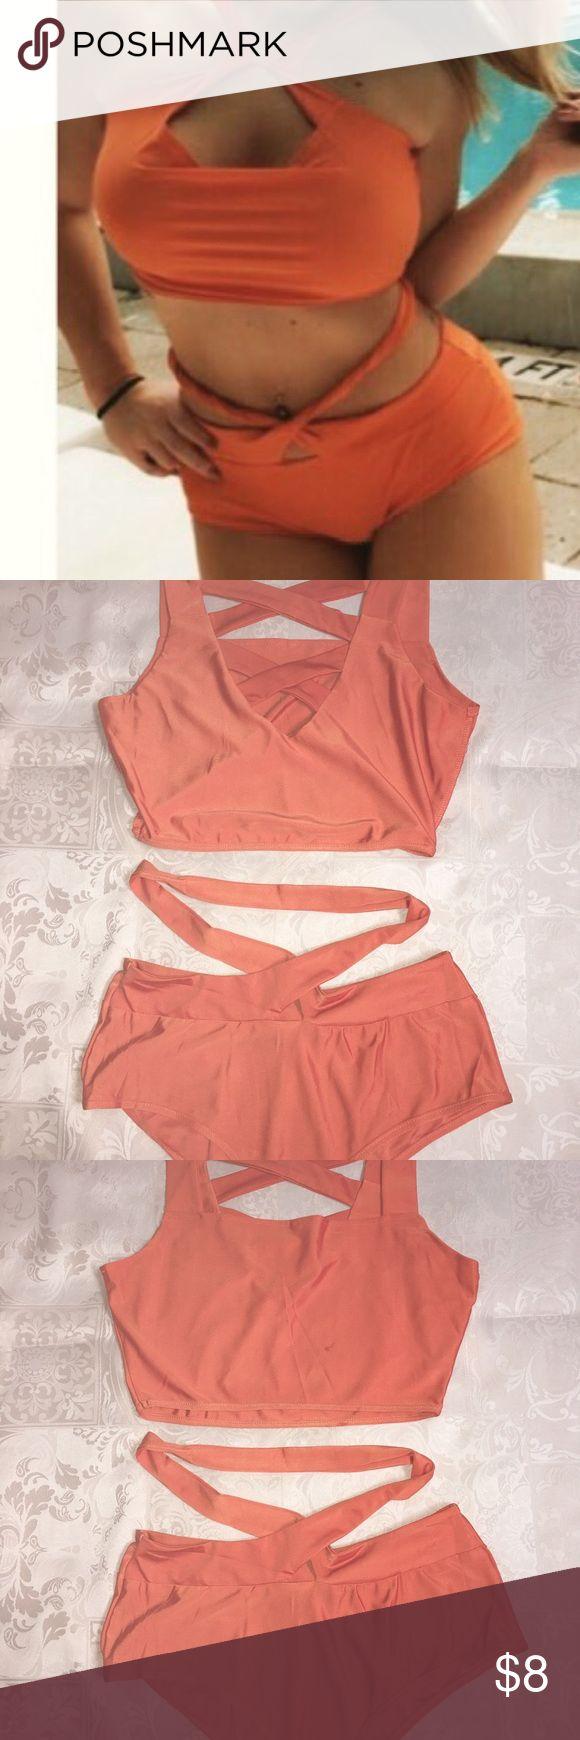 Orange bikini monokini size large Beautiful orange bikini. Can be worn several ways. Size large. Worn one time. Perfect for summer and vacations! Swim Bikinis